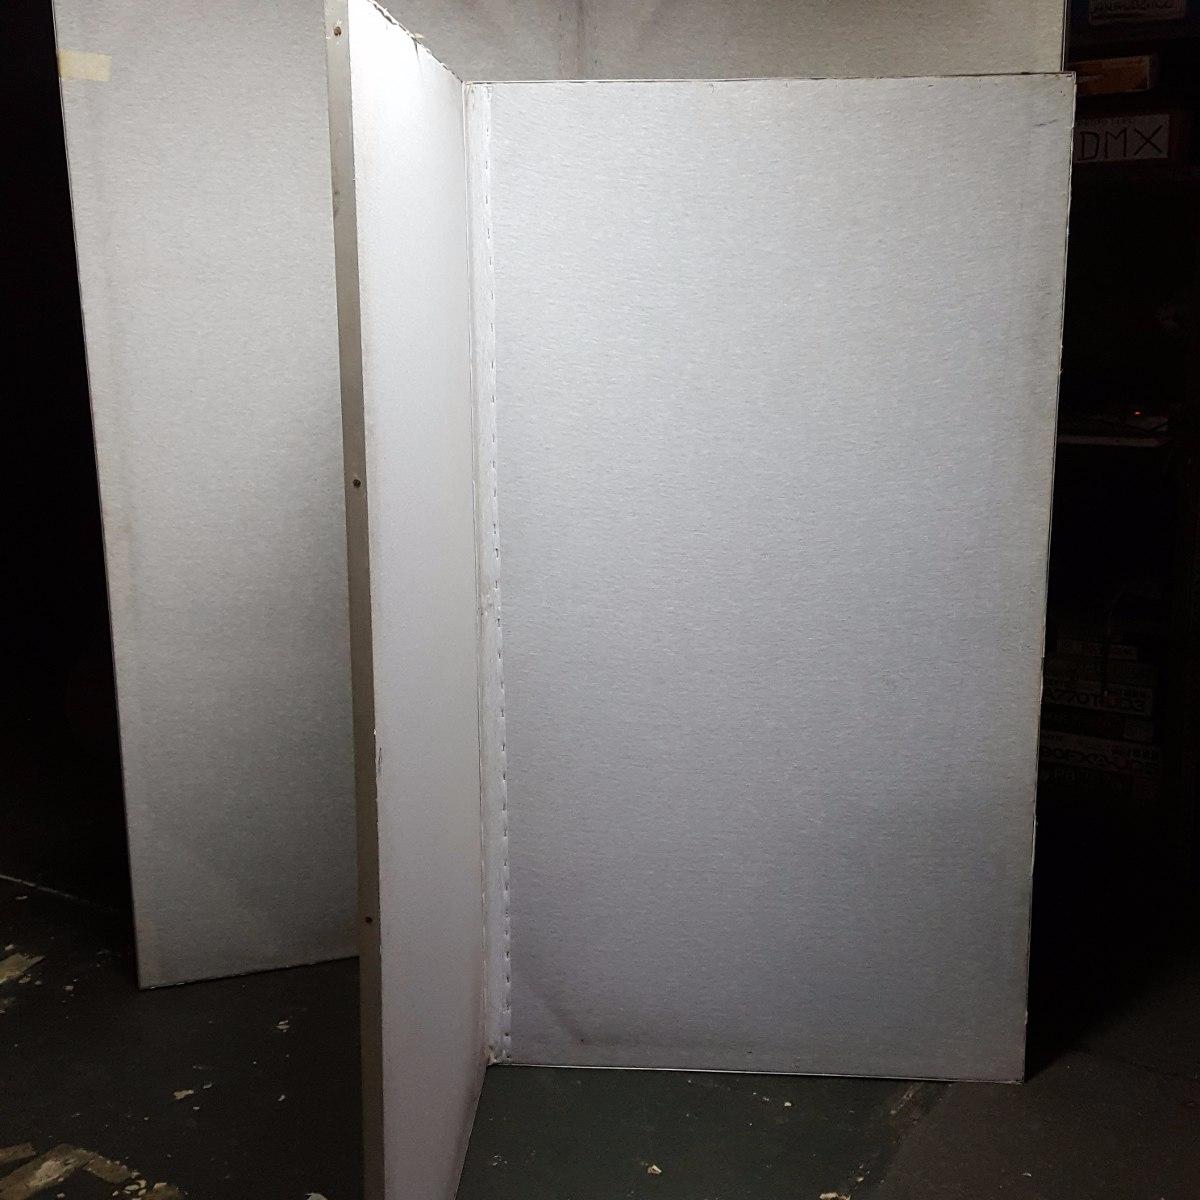 biombo separador x mts madera y tela con l aluminio